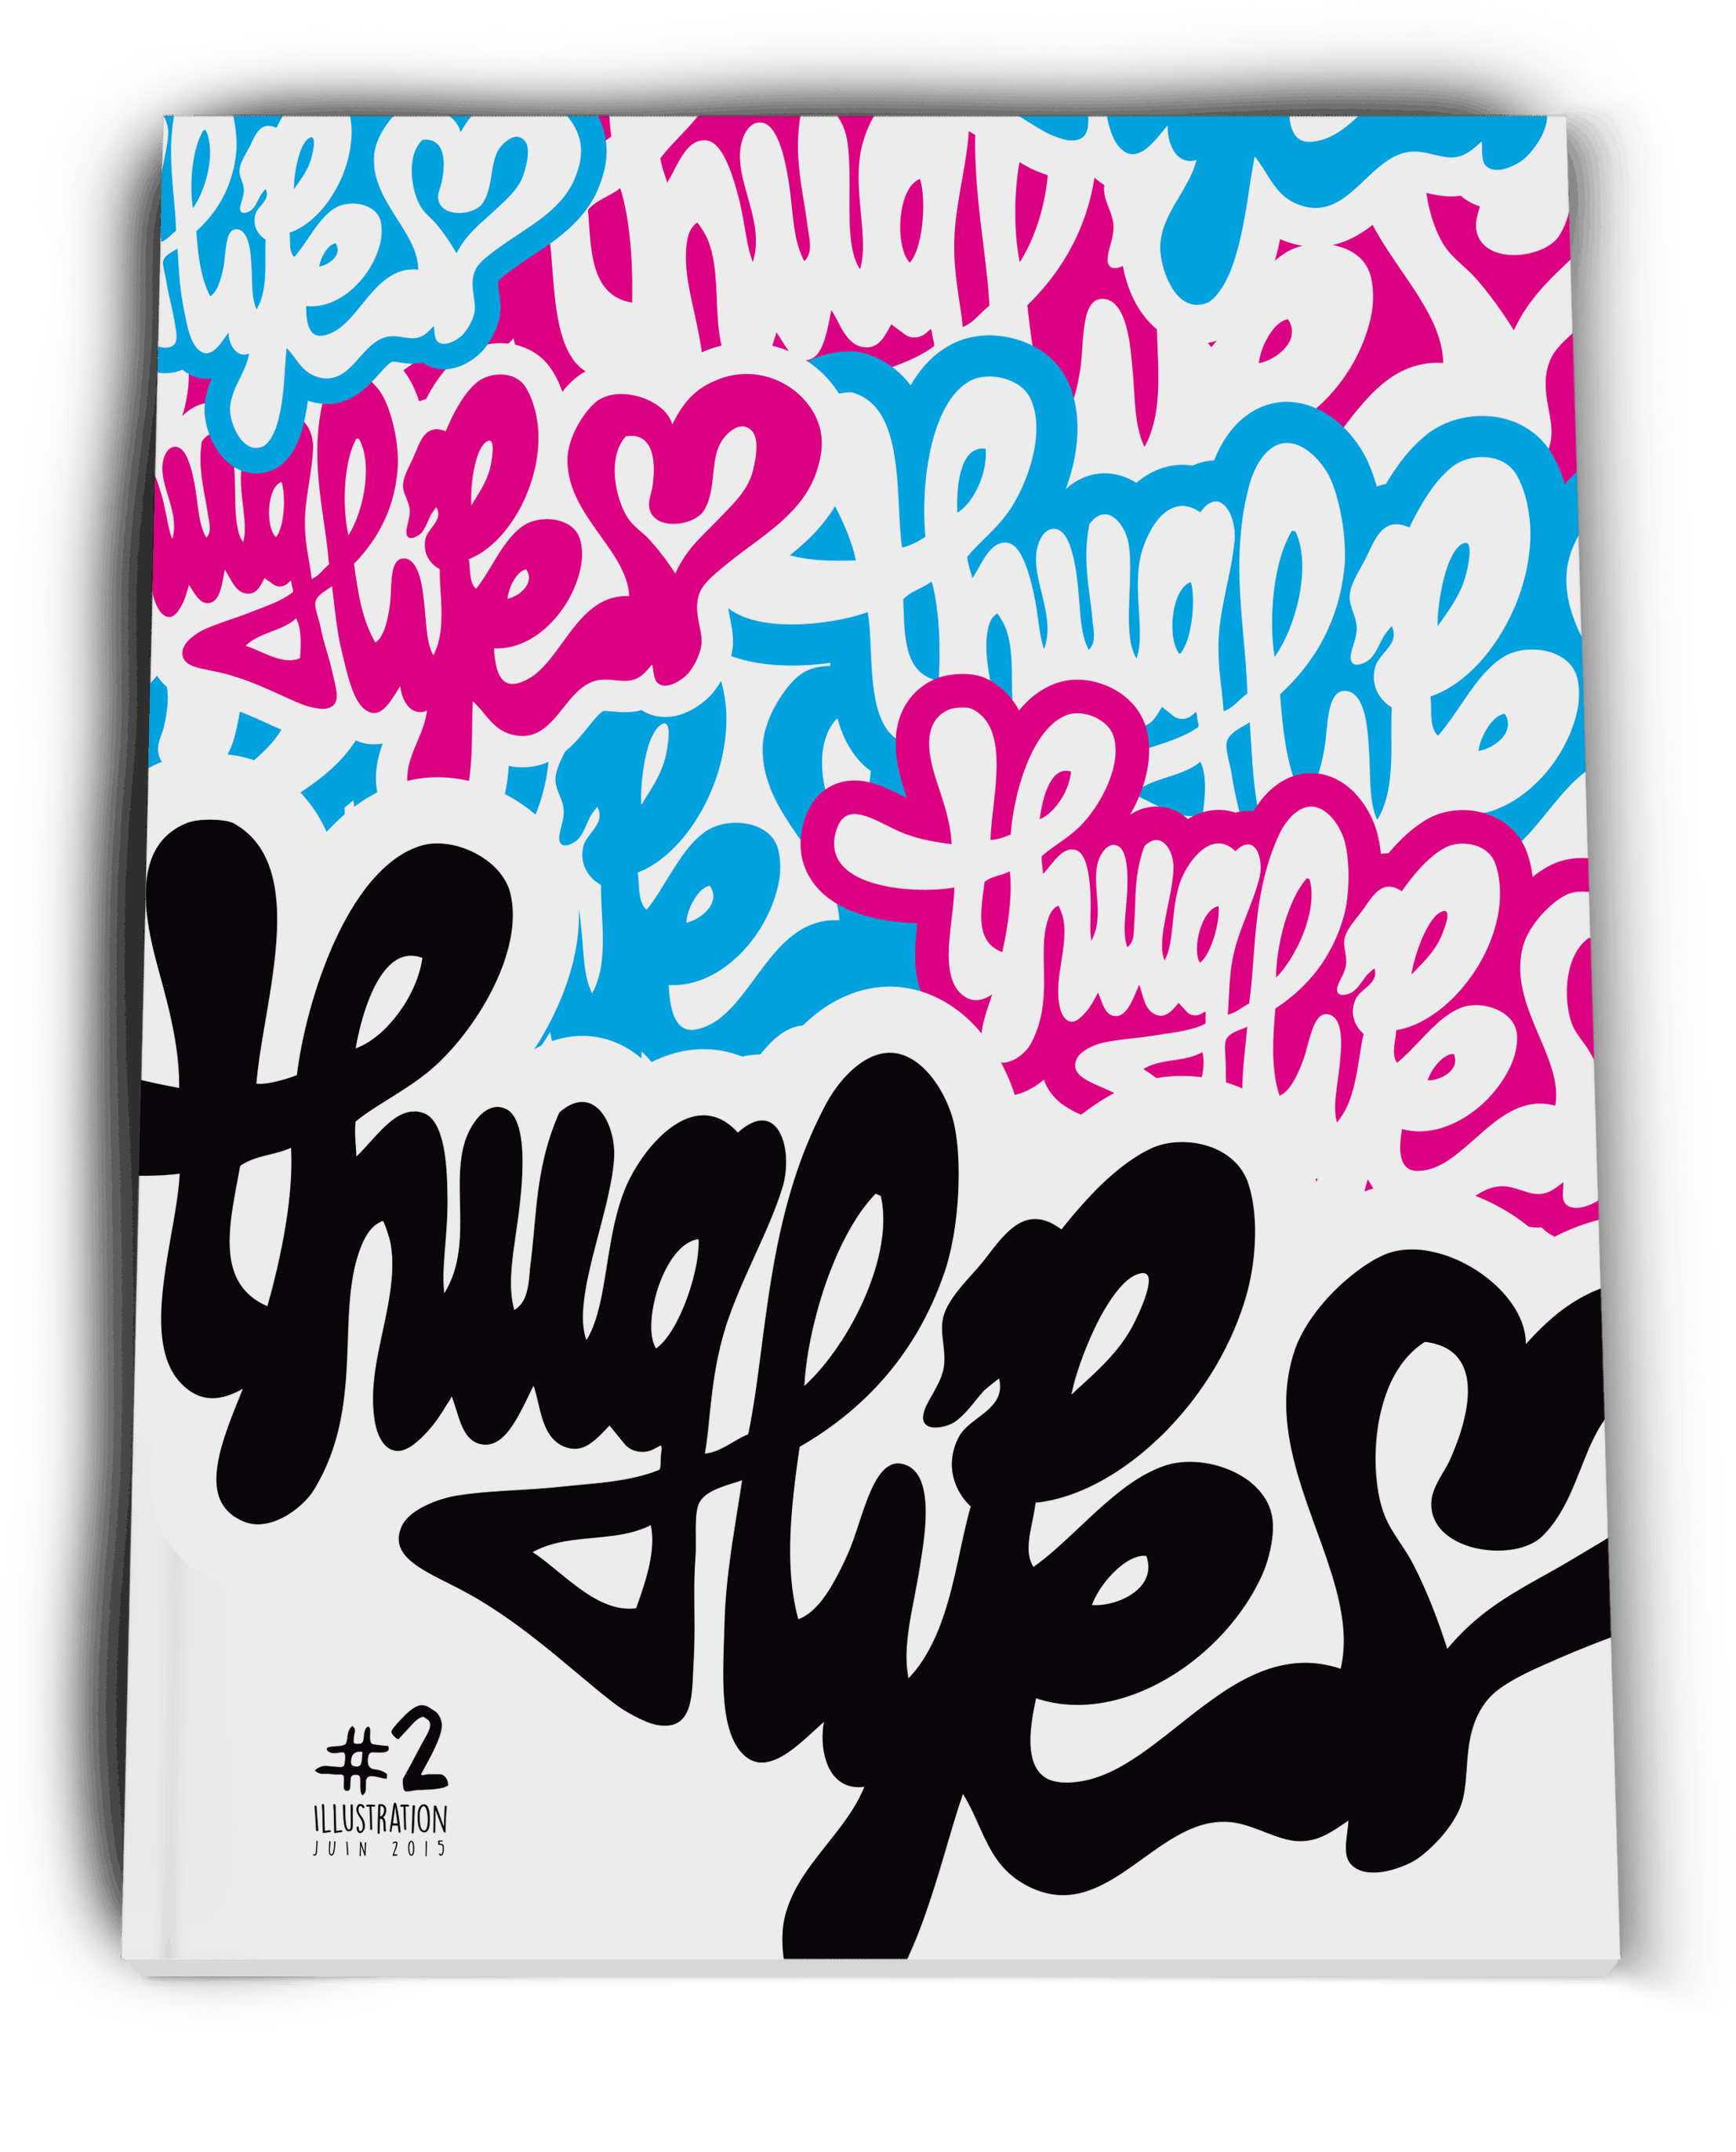 bebar thuglife magazine